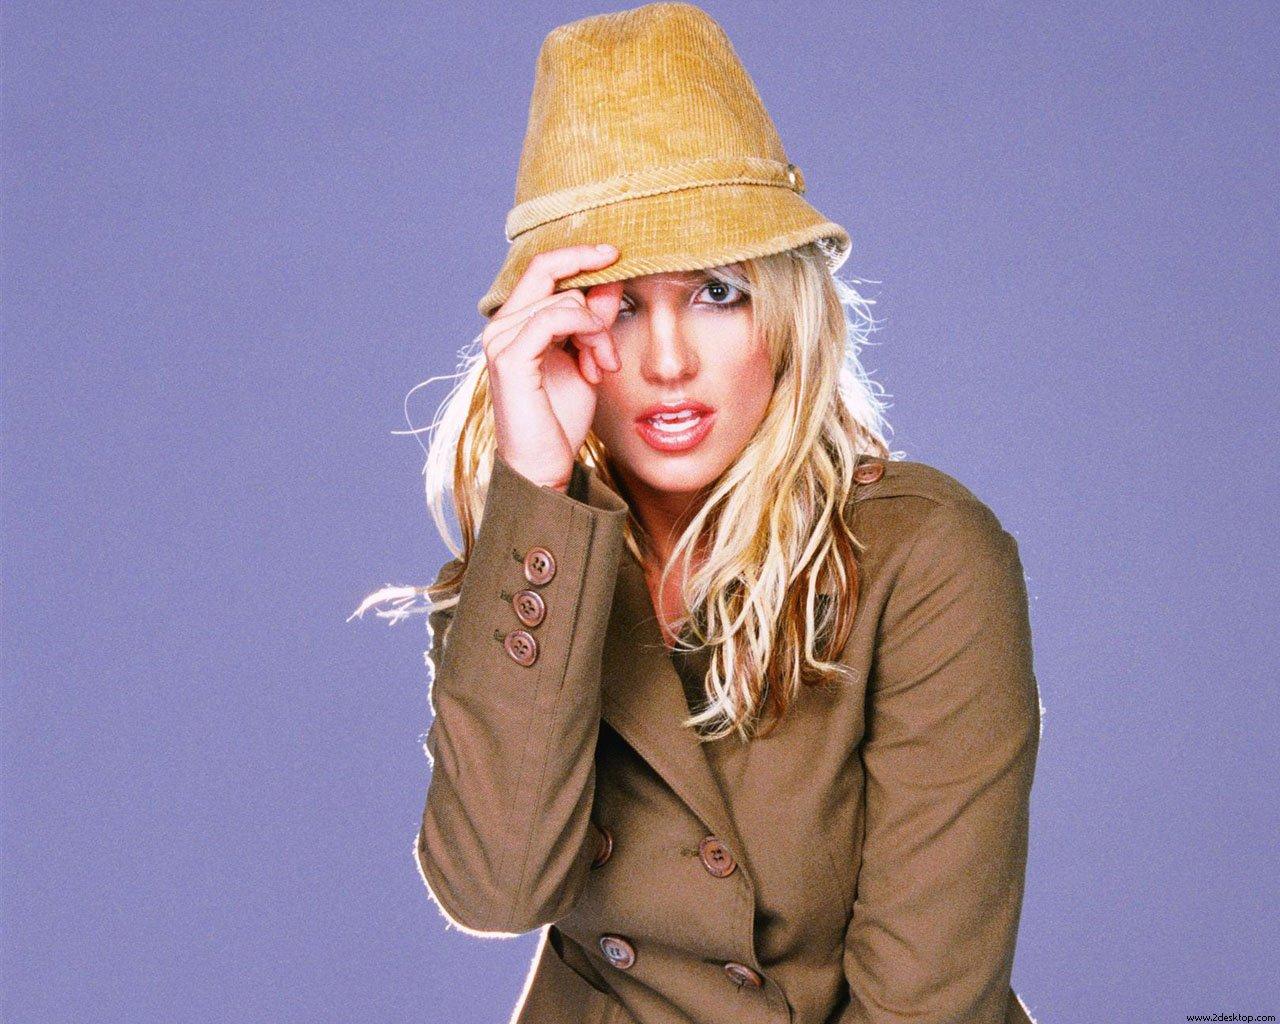 http://2.bp.blogspot.com/_PFHsbKpt1A4/TOQyjPwv4pI/AAAAAAAAASo/-VyaV5oZEtM/s1600/Britney_Spears_6200.jpg